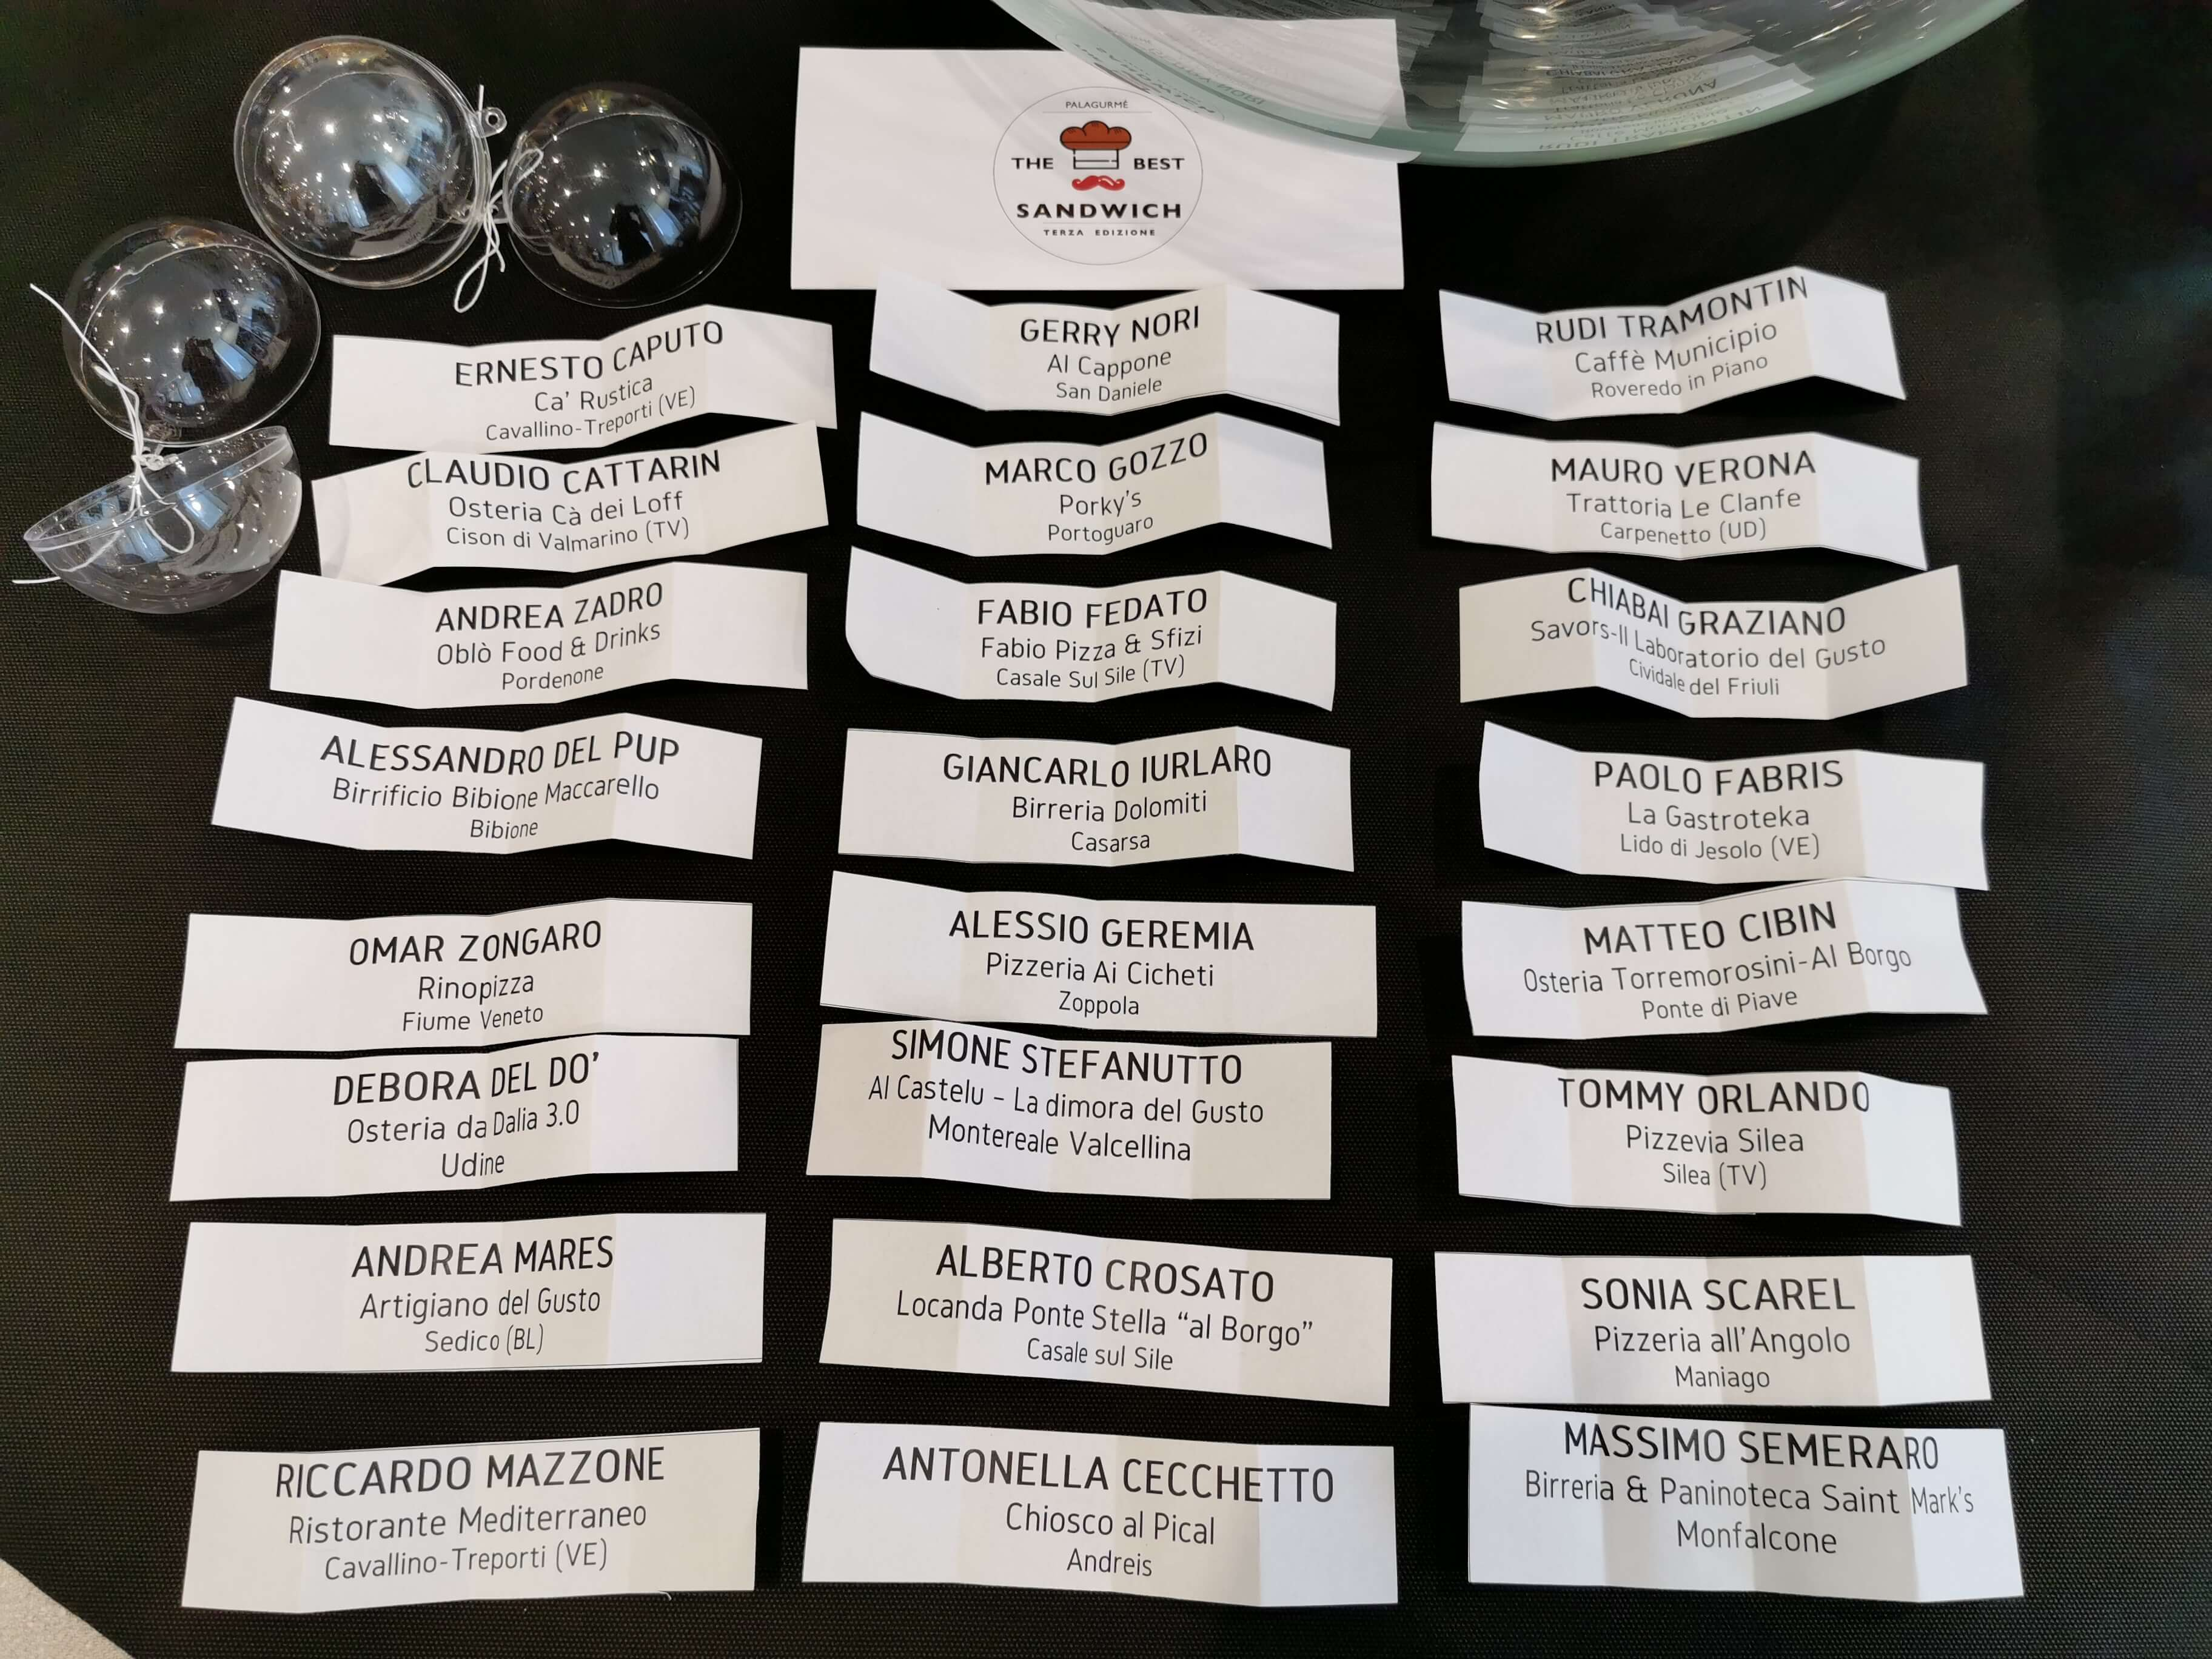 20190912_palagurmé_elenco dei partecipanti a TBS